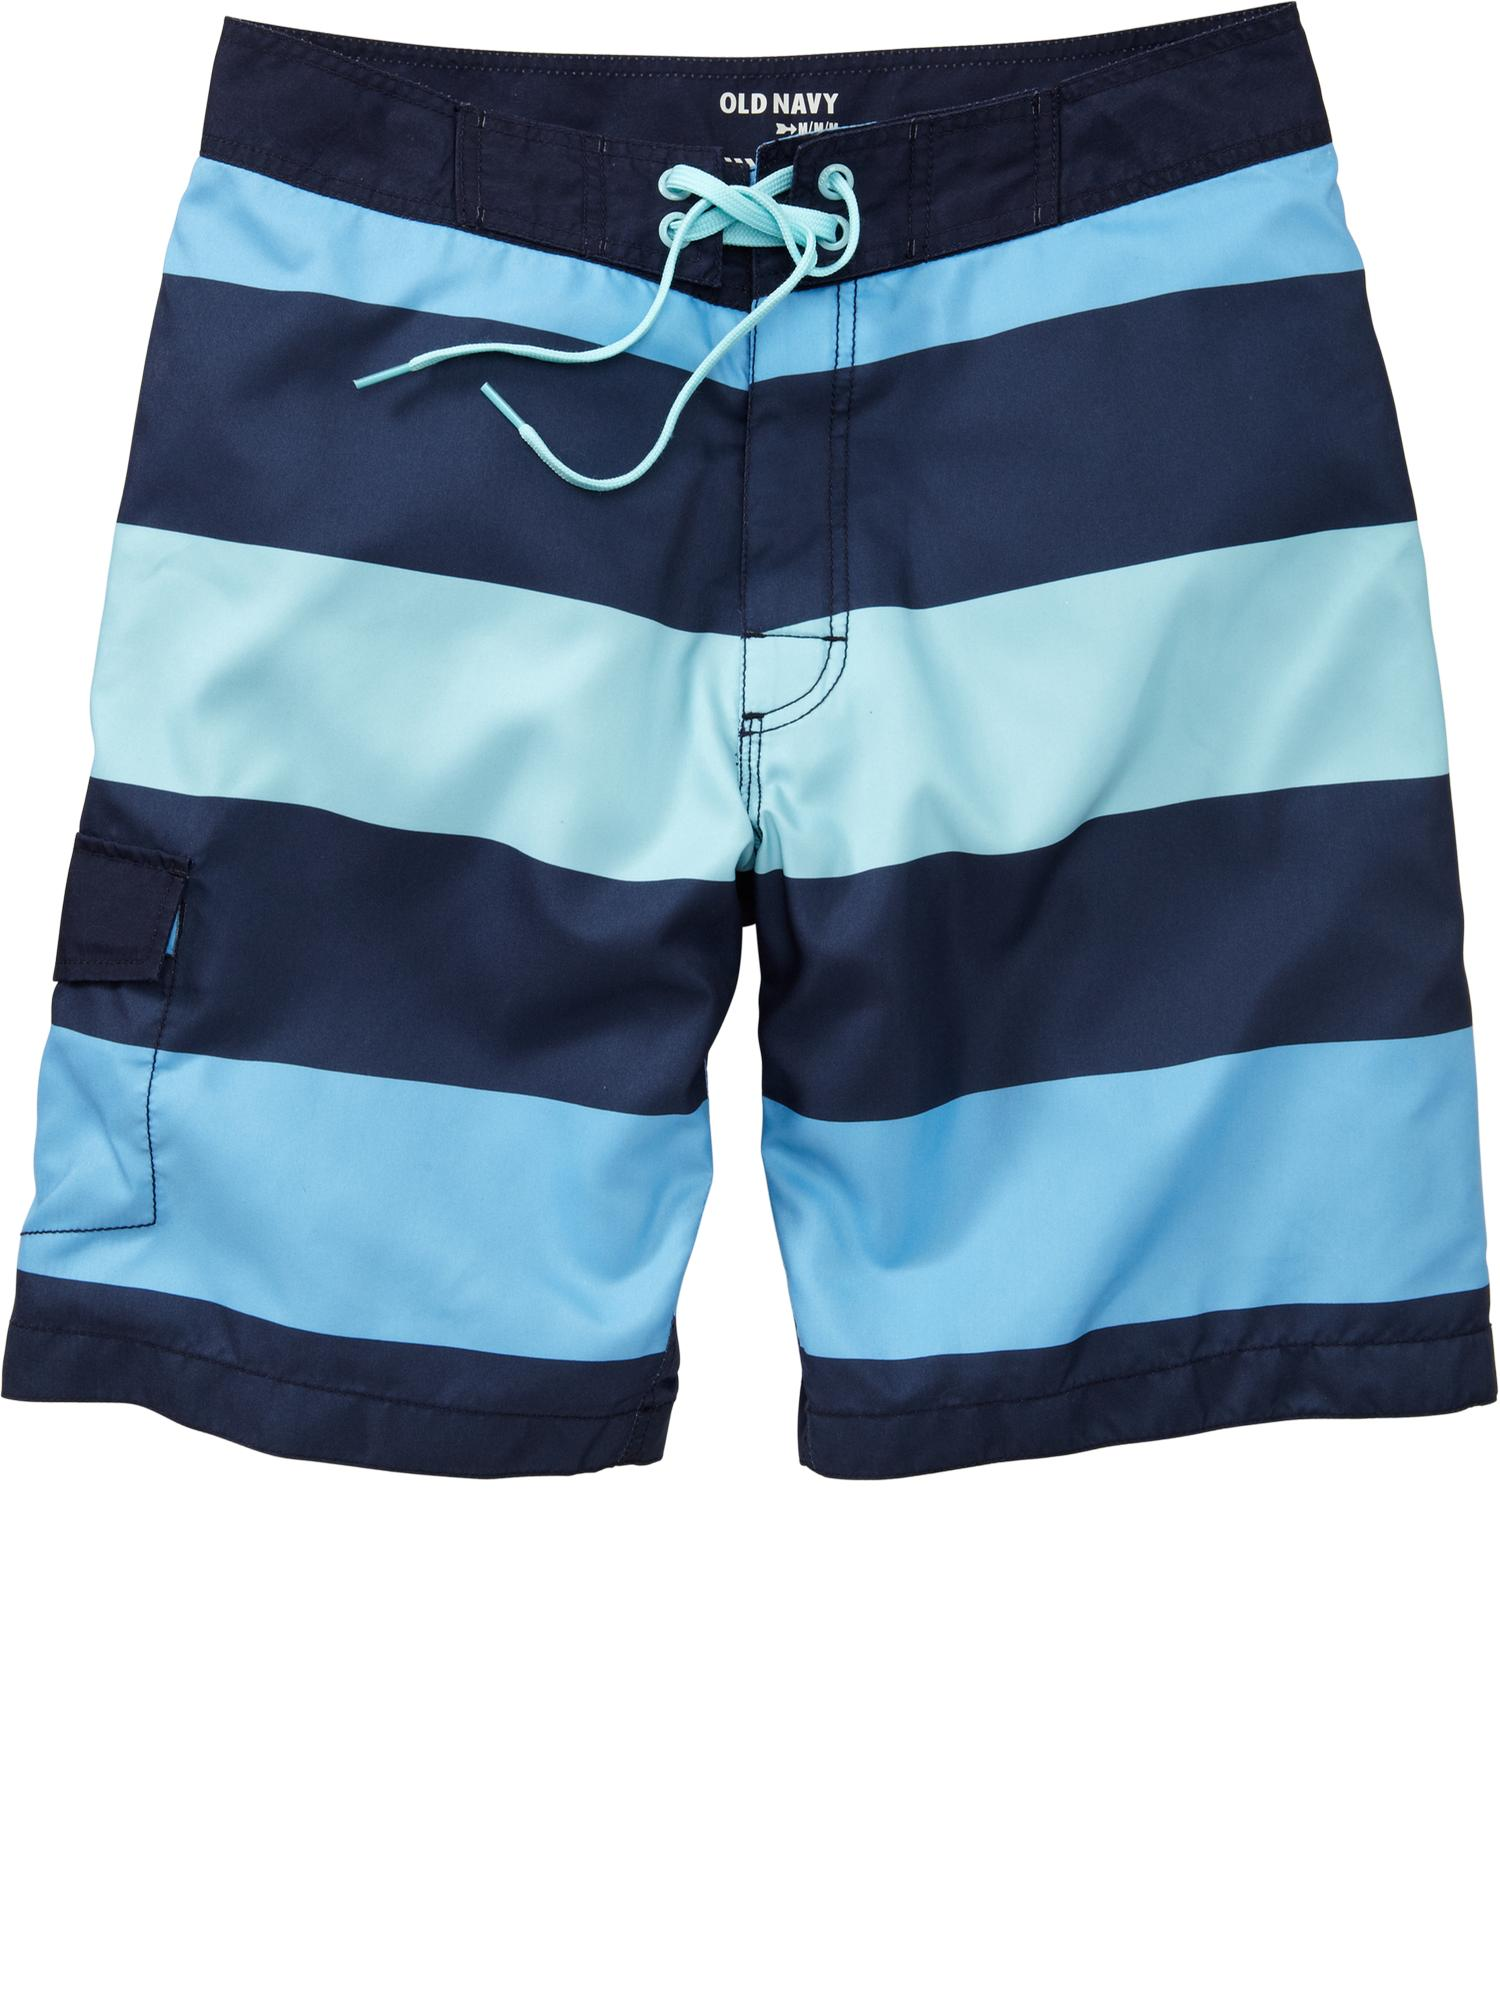 Quiksilver Boardshorts 2013 Old Navy Multi-stripe ...